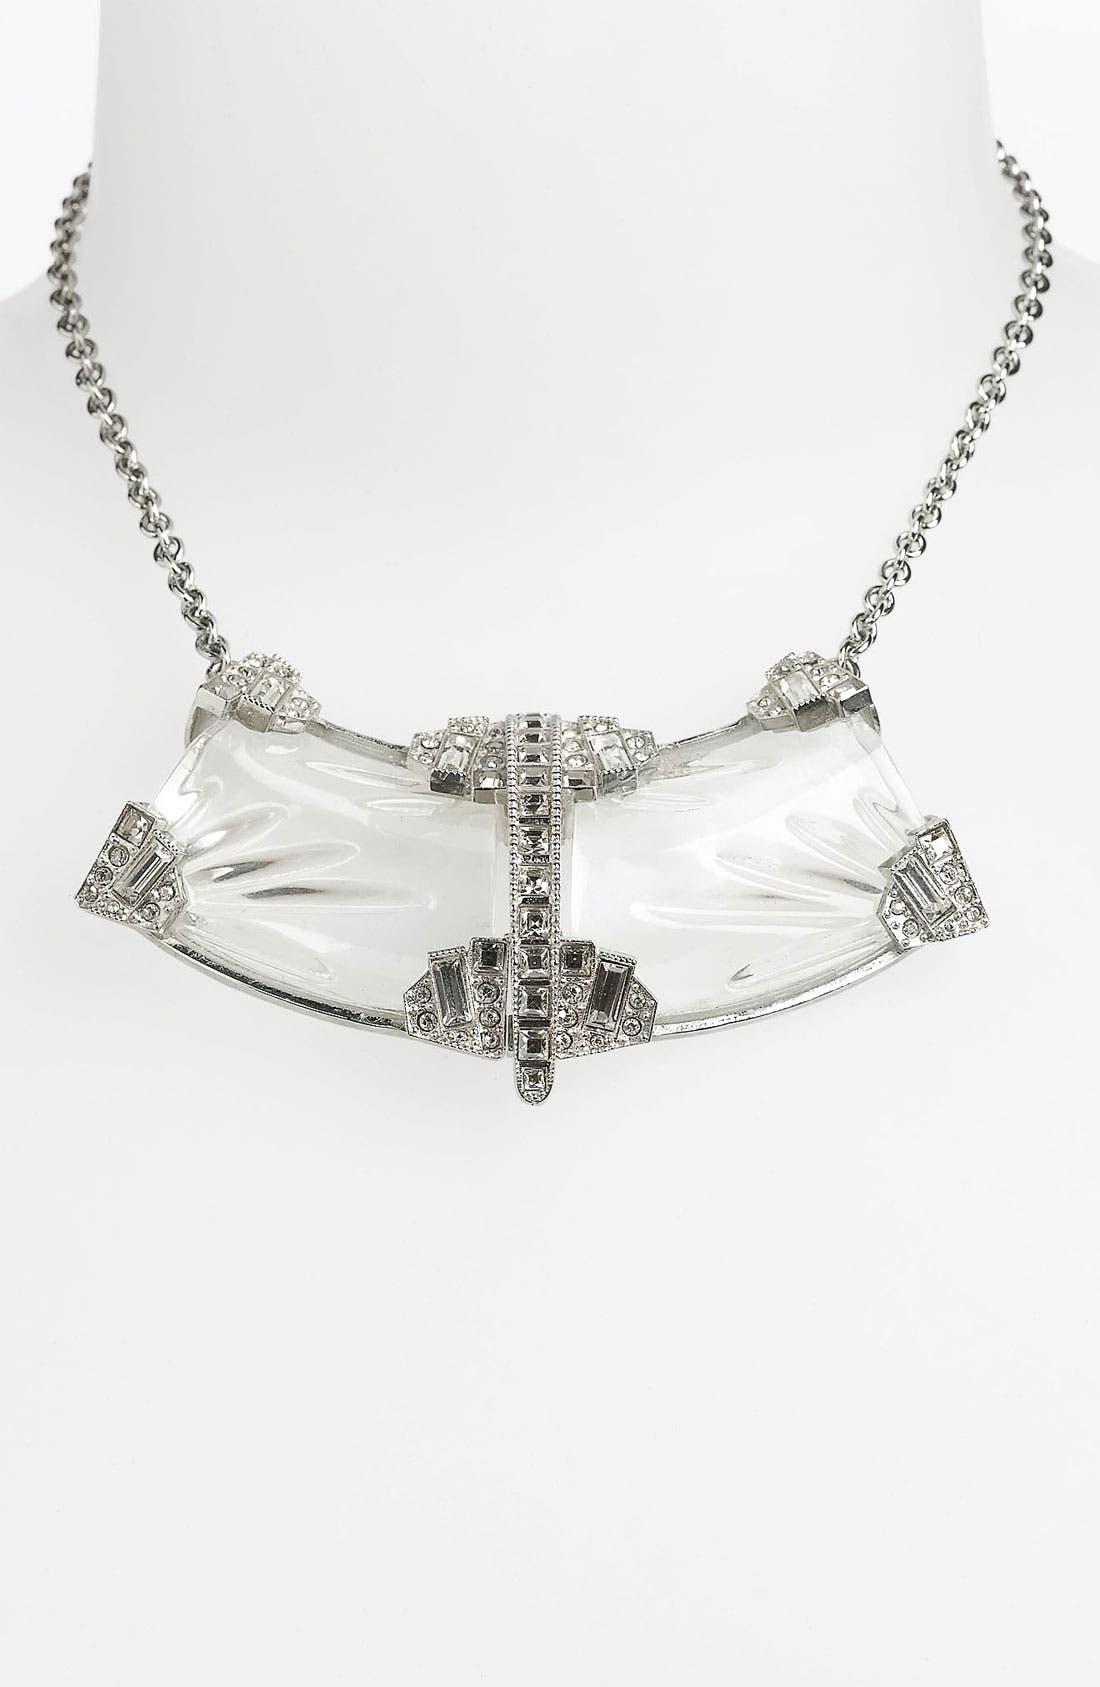 Main Image - Alexis Bittar 'Teatro Moderne' Bib Necklace (Nordstrom Exclusive)